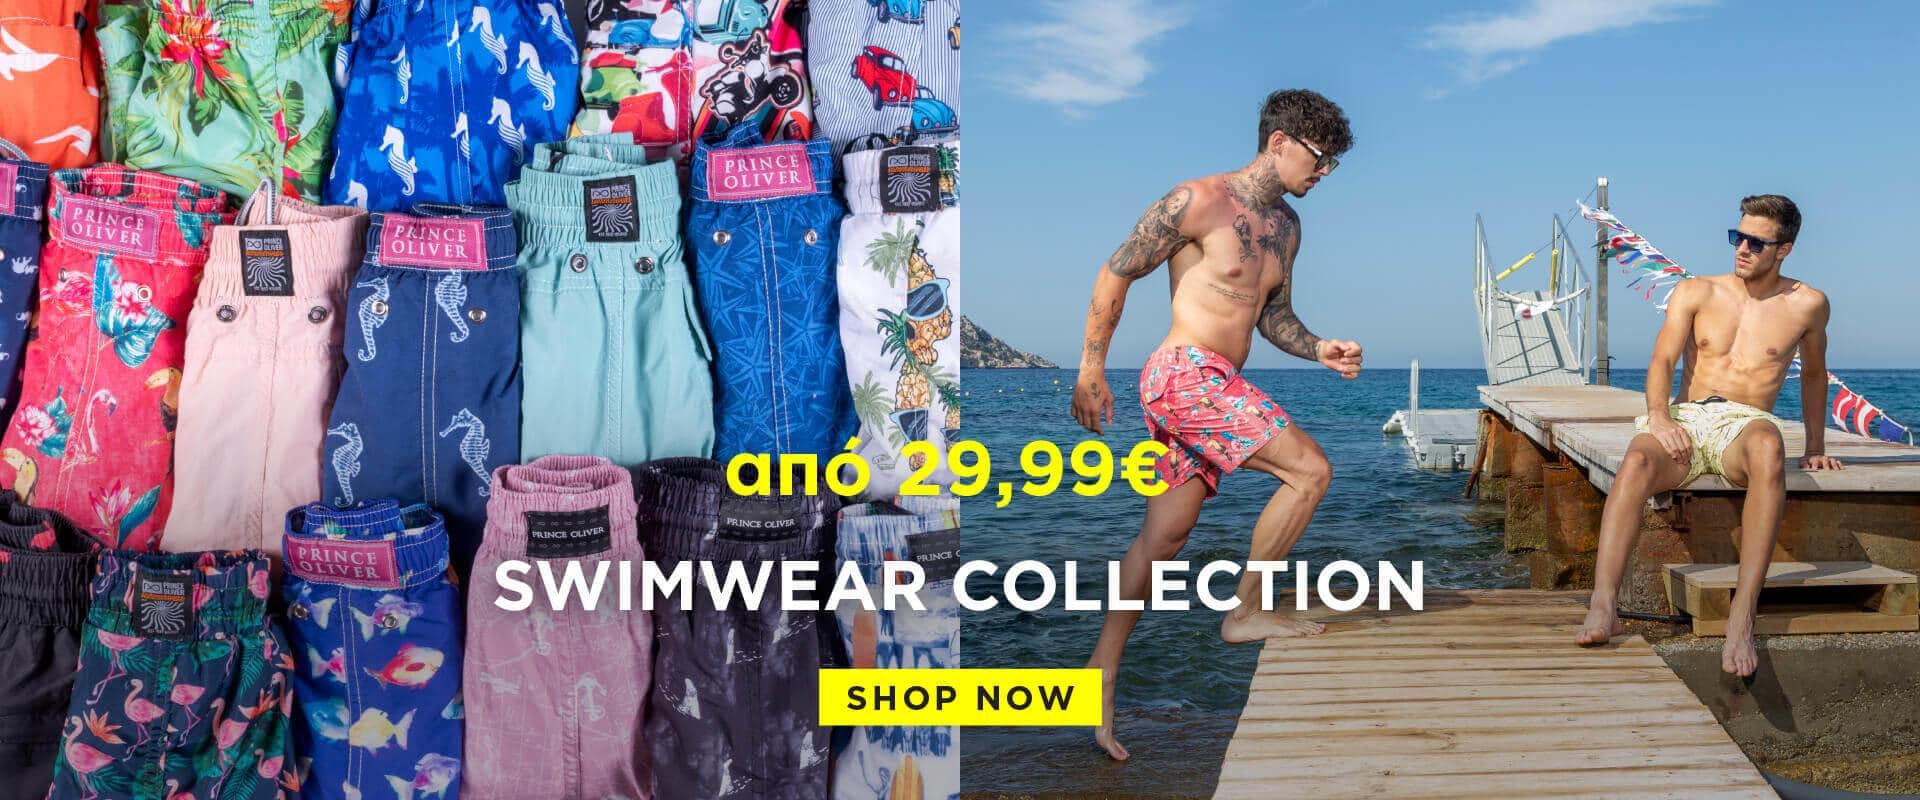 banner_man_swimwear gr